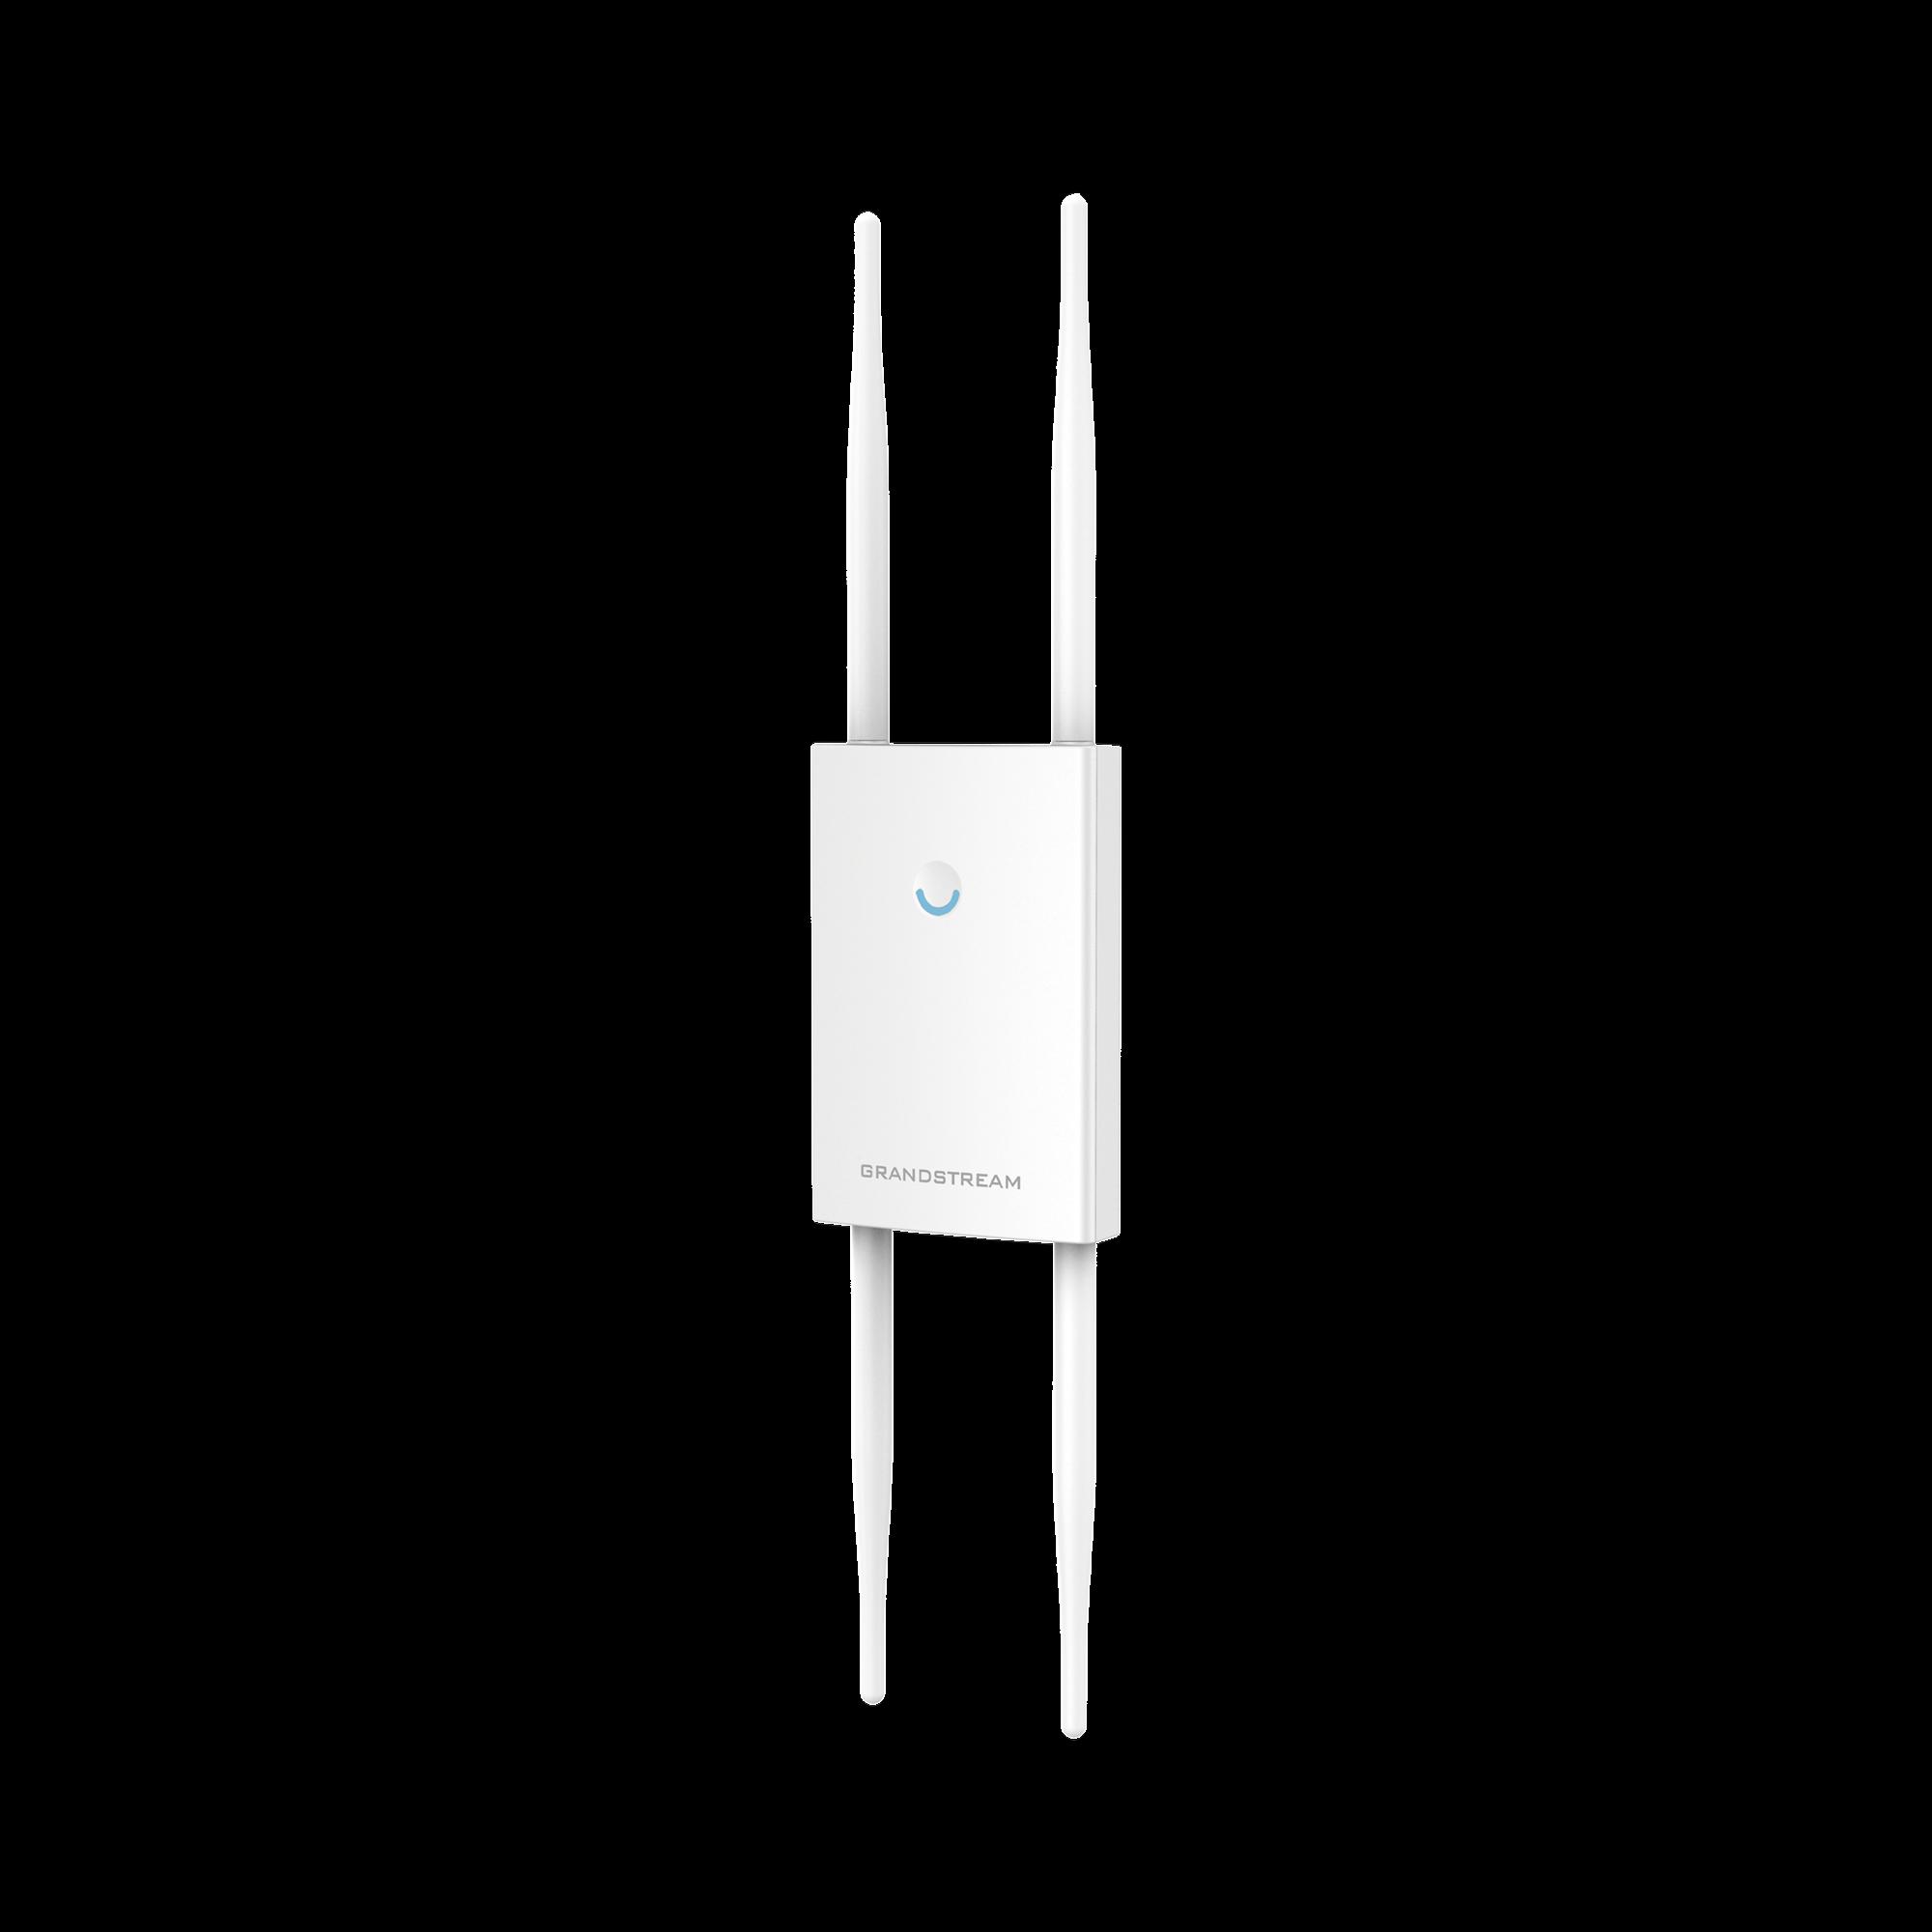 Potente Punto de Acceso Wi-Fi MU-MIMO 4?4:4 para exterior de largo alcance, stand-alone o configuración desde la nube